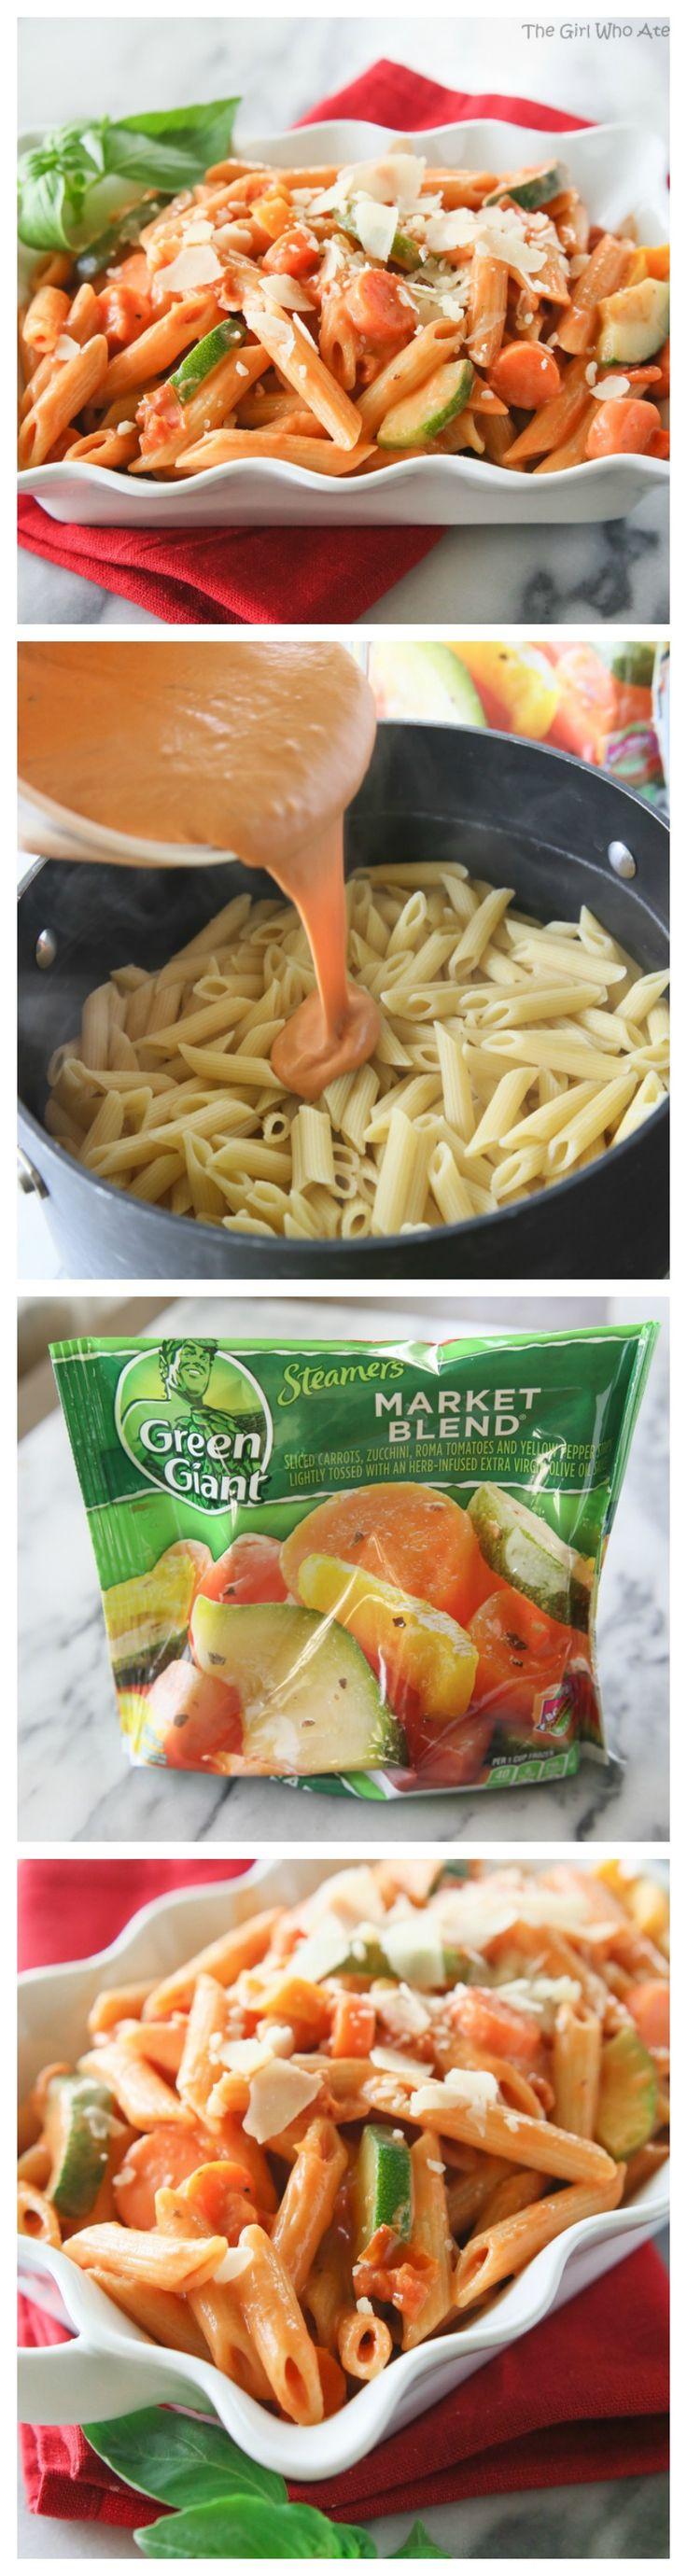 Creamy Pasta Primavera - or as my kids say, pasta with pink sauce and veggies.